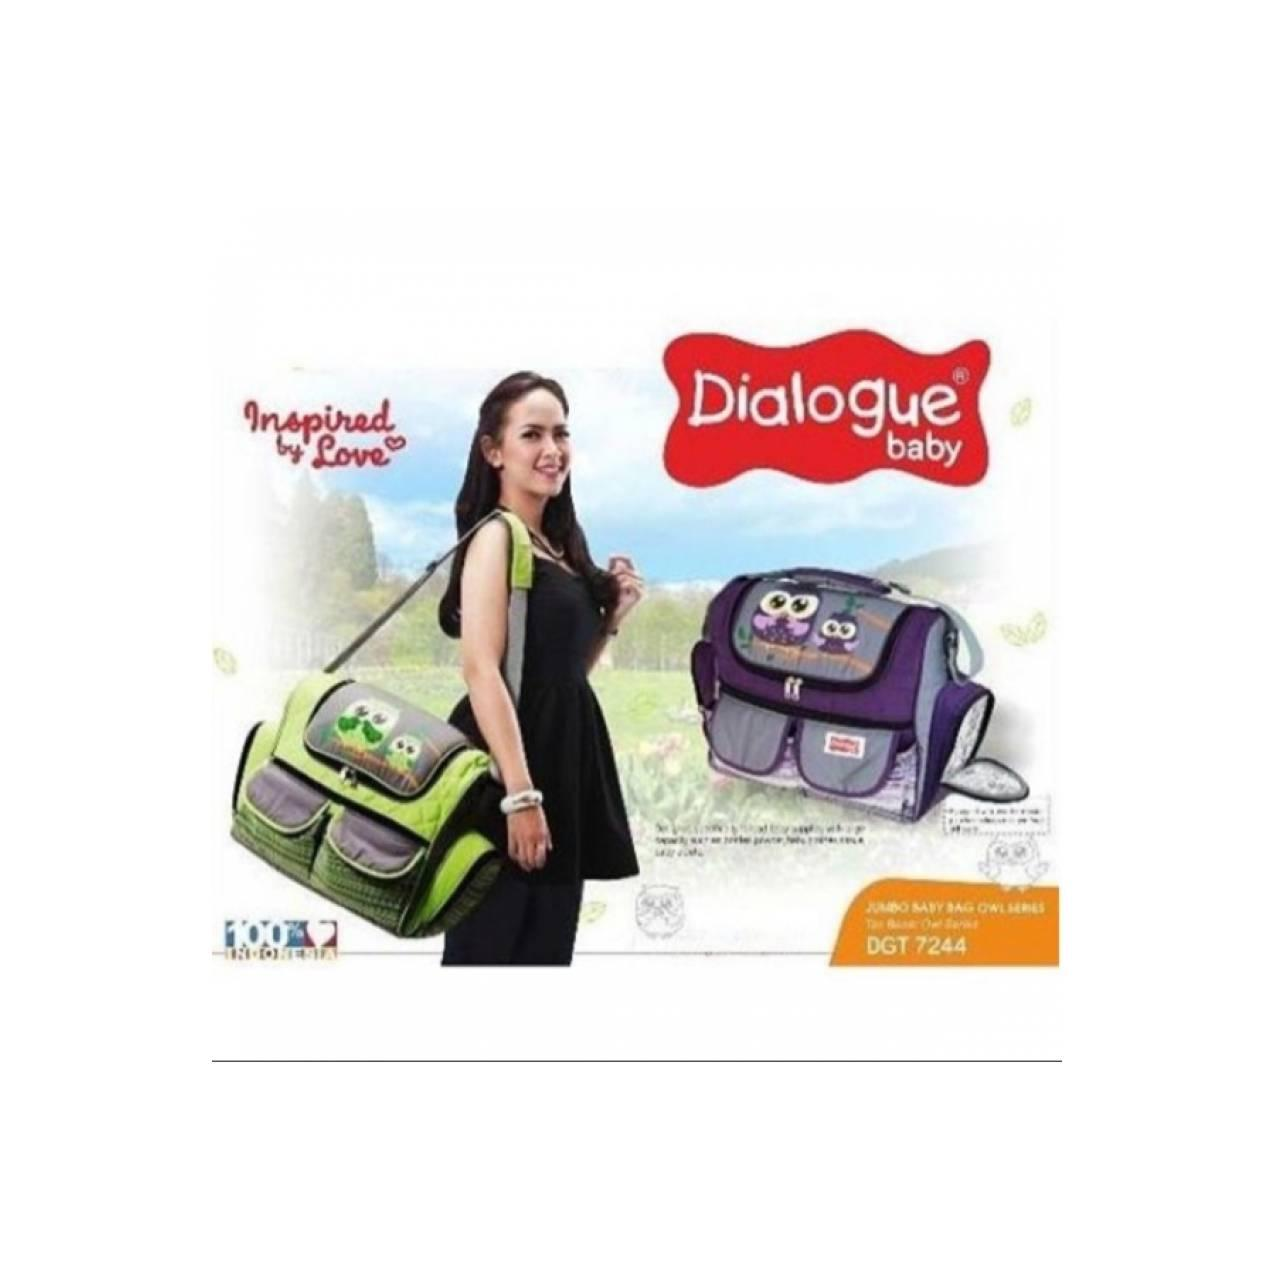 Jual Dialogue Tas Besar Jumbo Bonus MiniBag Owl Series DGT 7237